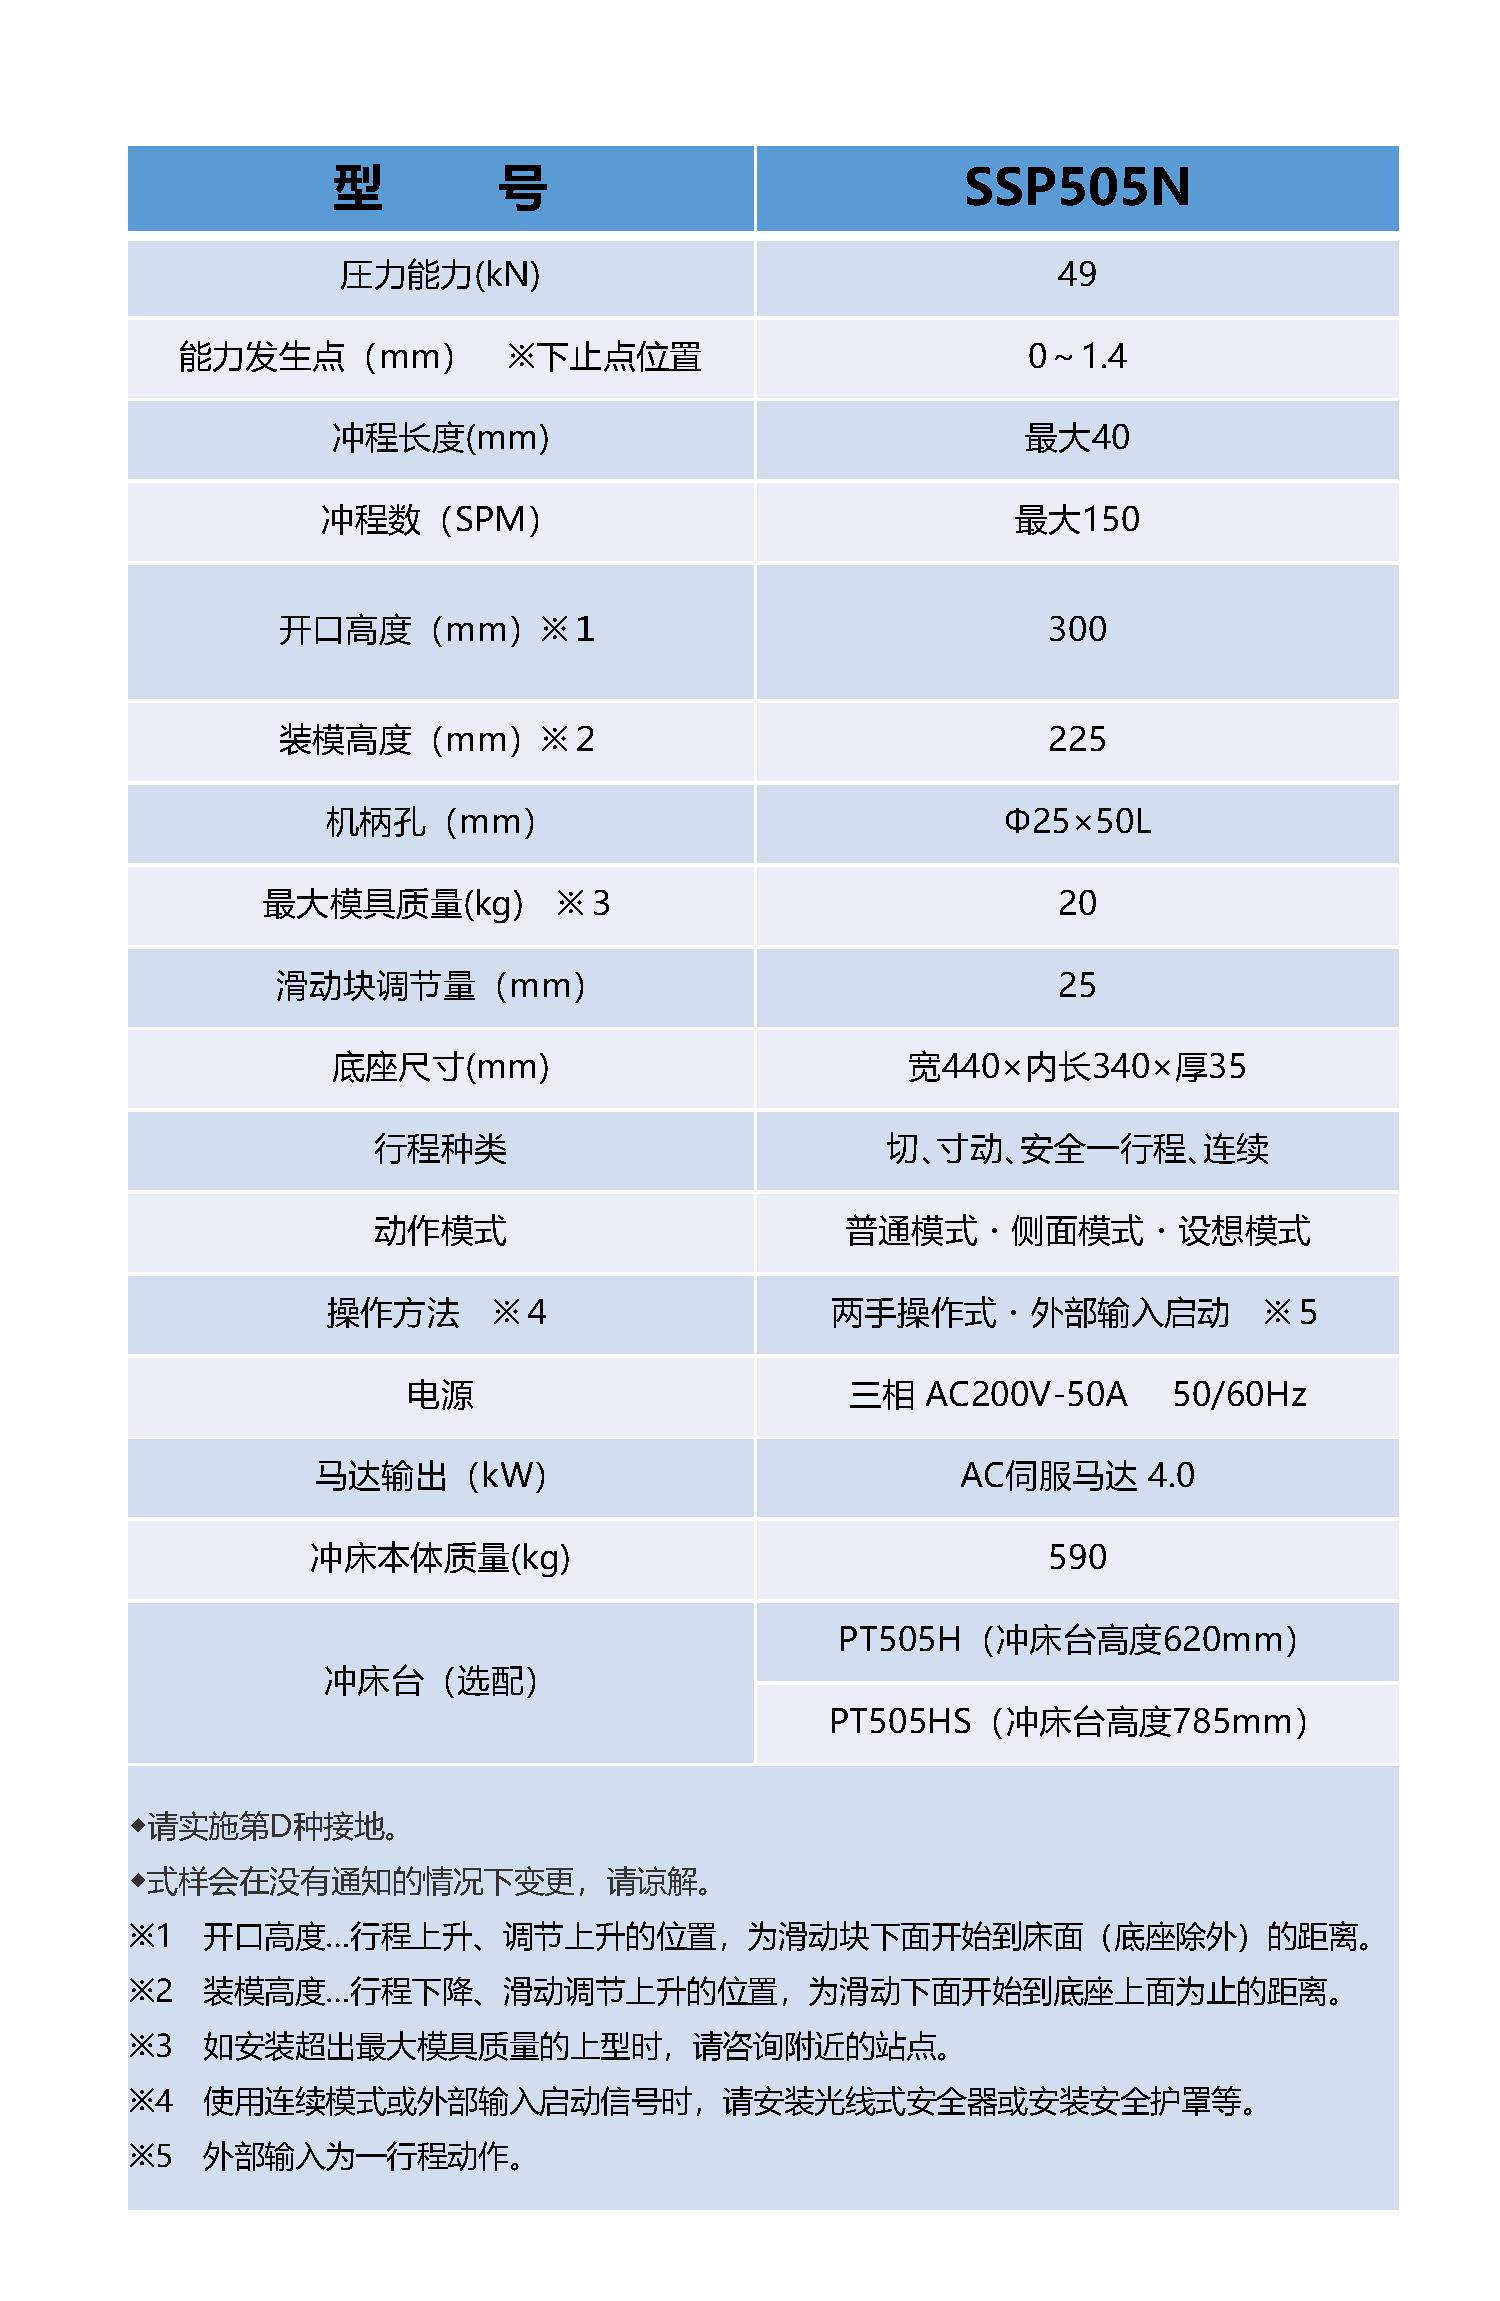 SSP505N_仕様表_D - 中文.png